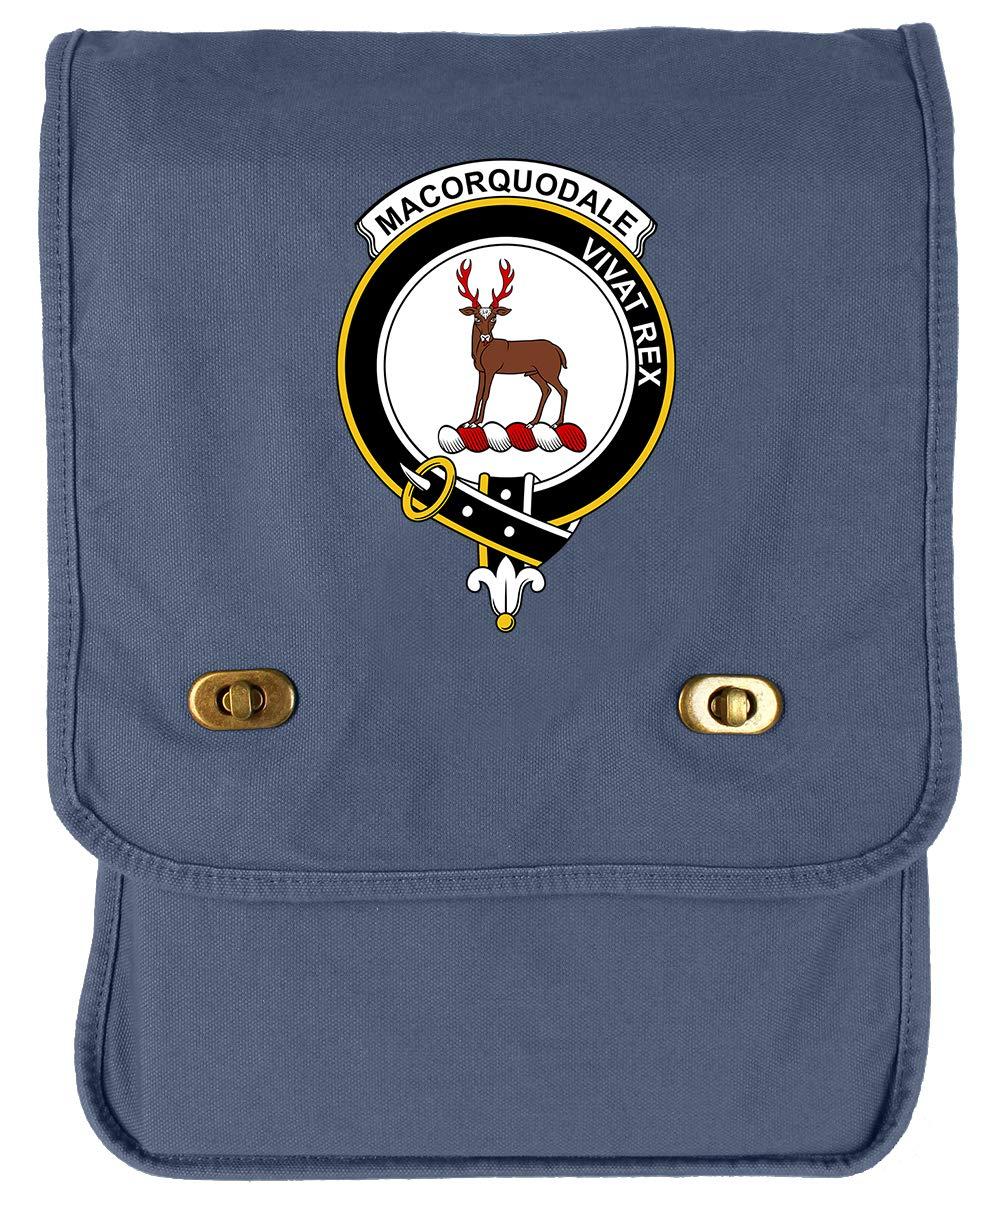 Tenacitee Scottish Clan Crest Badge MacCorquodale Flamingo Raw Edge Canvas Messenger Bag